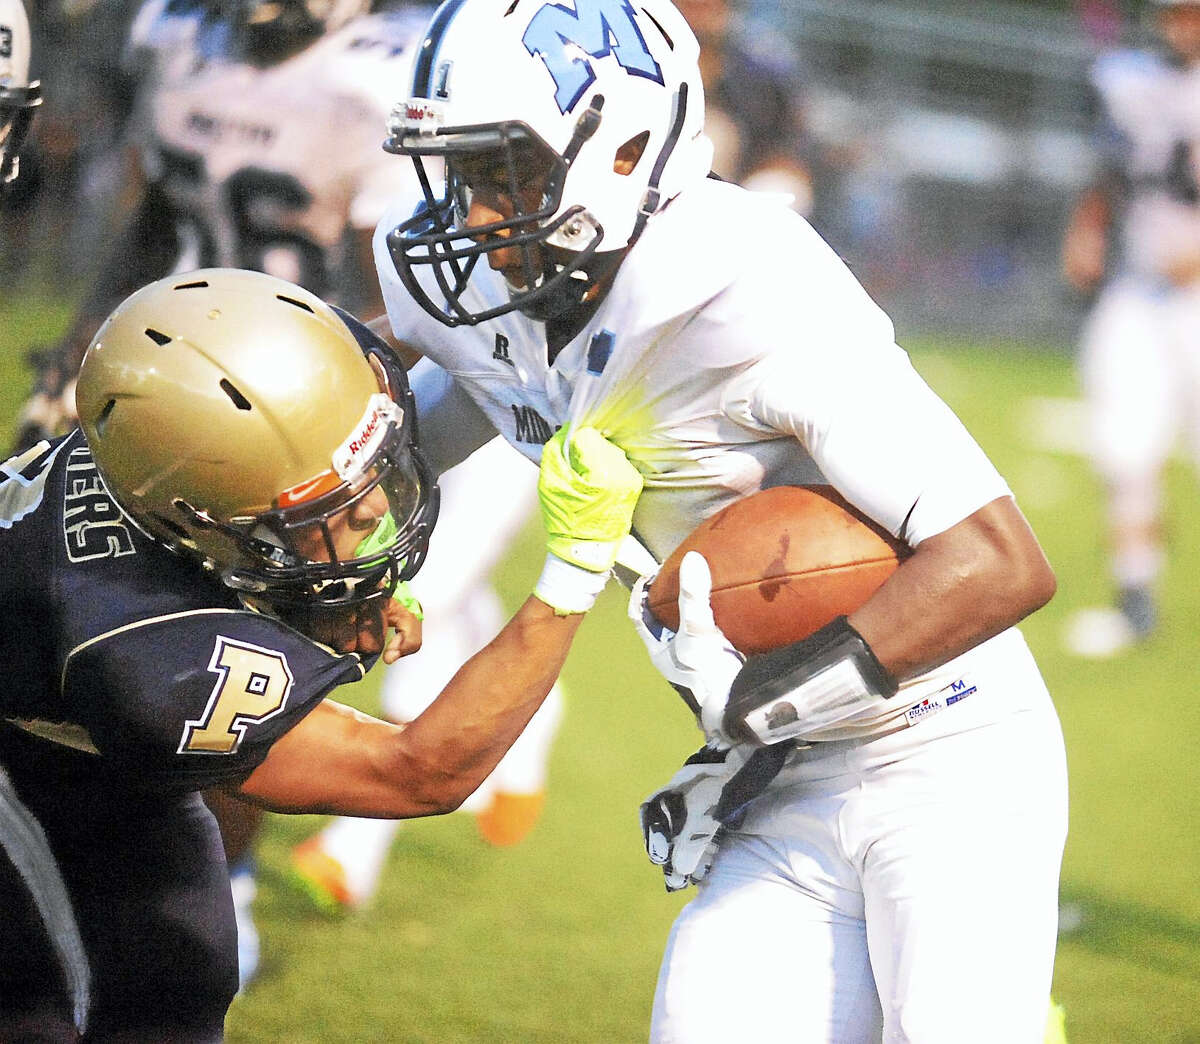 Platt's Tylon Papallo tries to slow down Middletown senior quarterback Tyshaun James in the Blue Dragons' 49-24 win last week. Middletown hosts Wethersfield tonight at Rosek-Skubel Stadium.